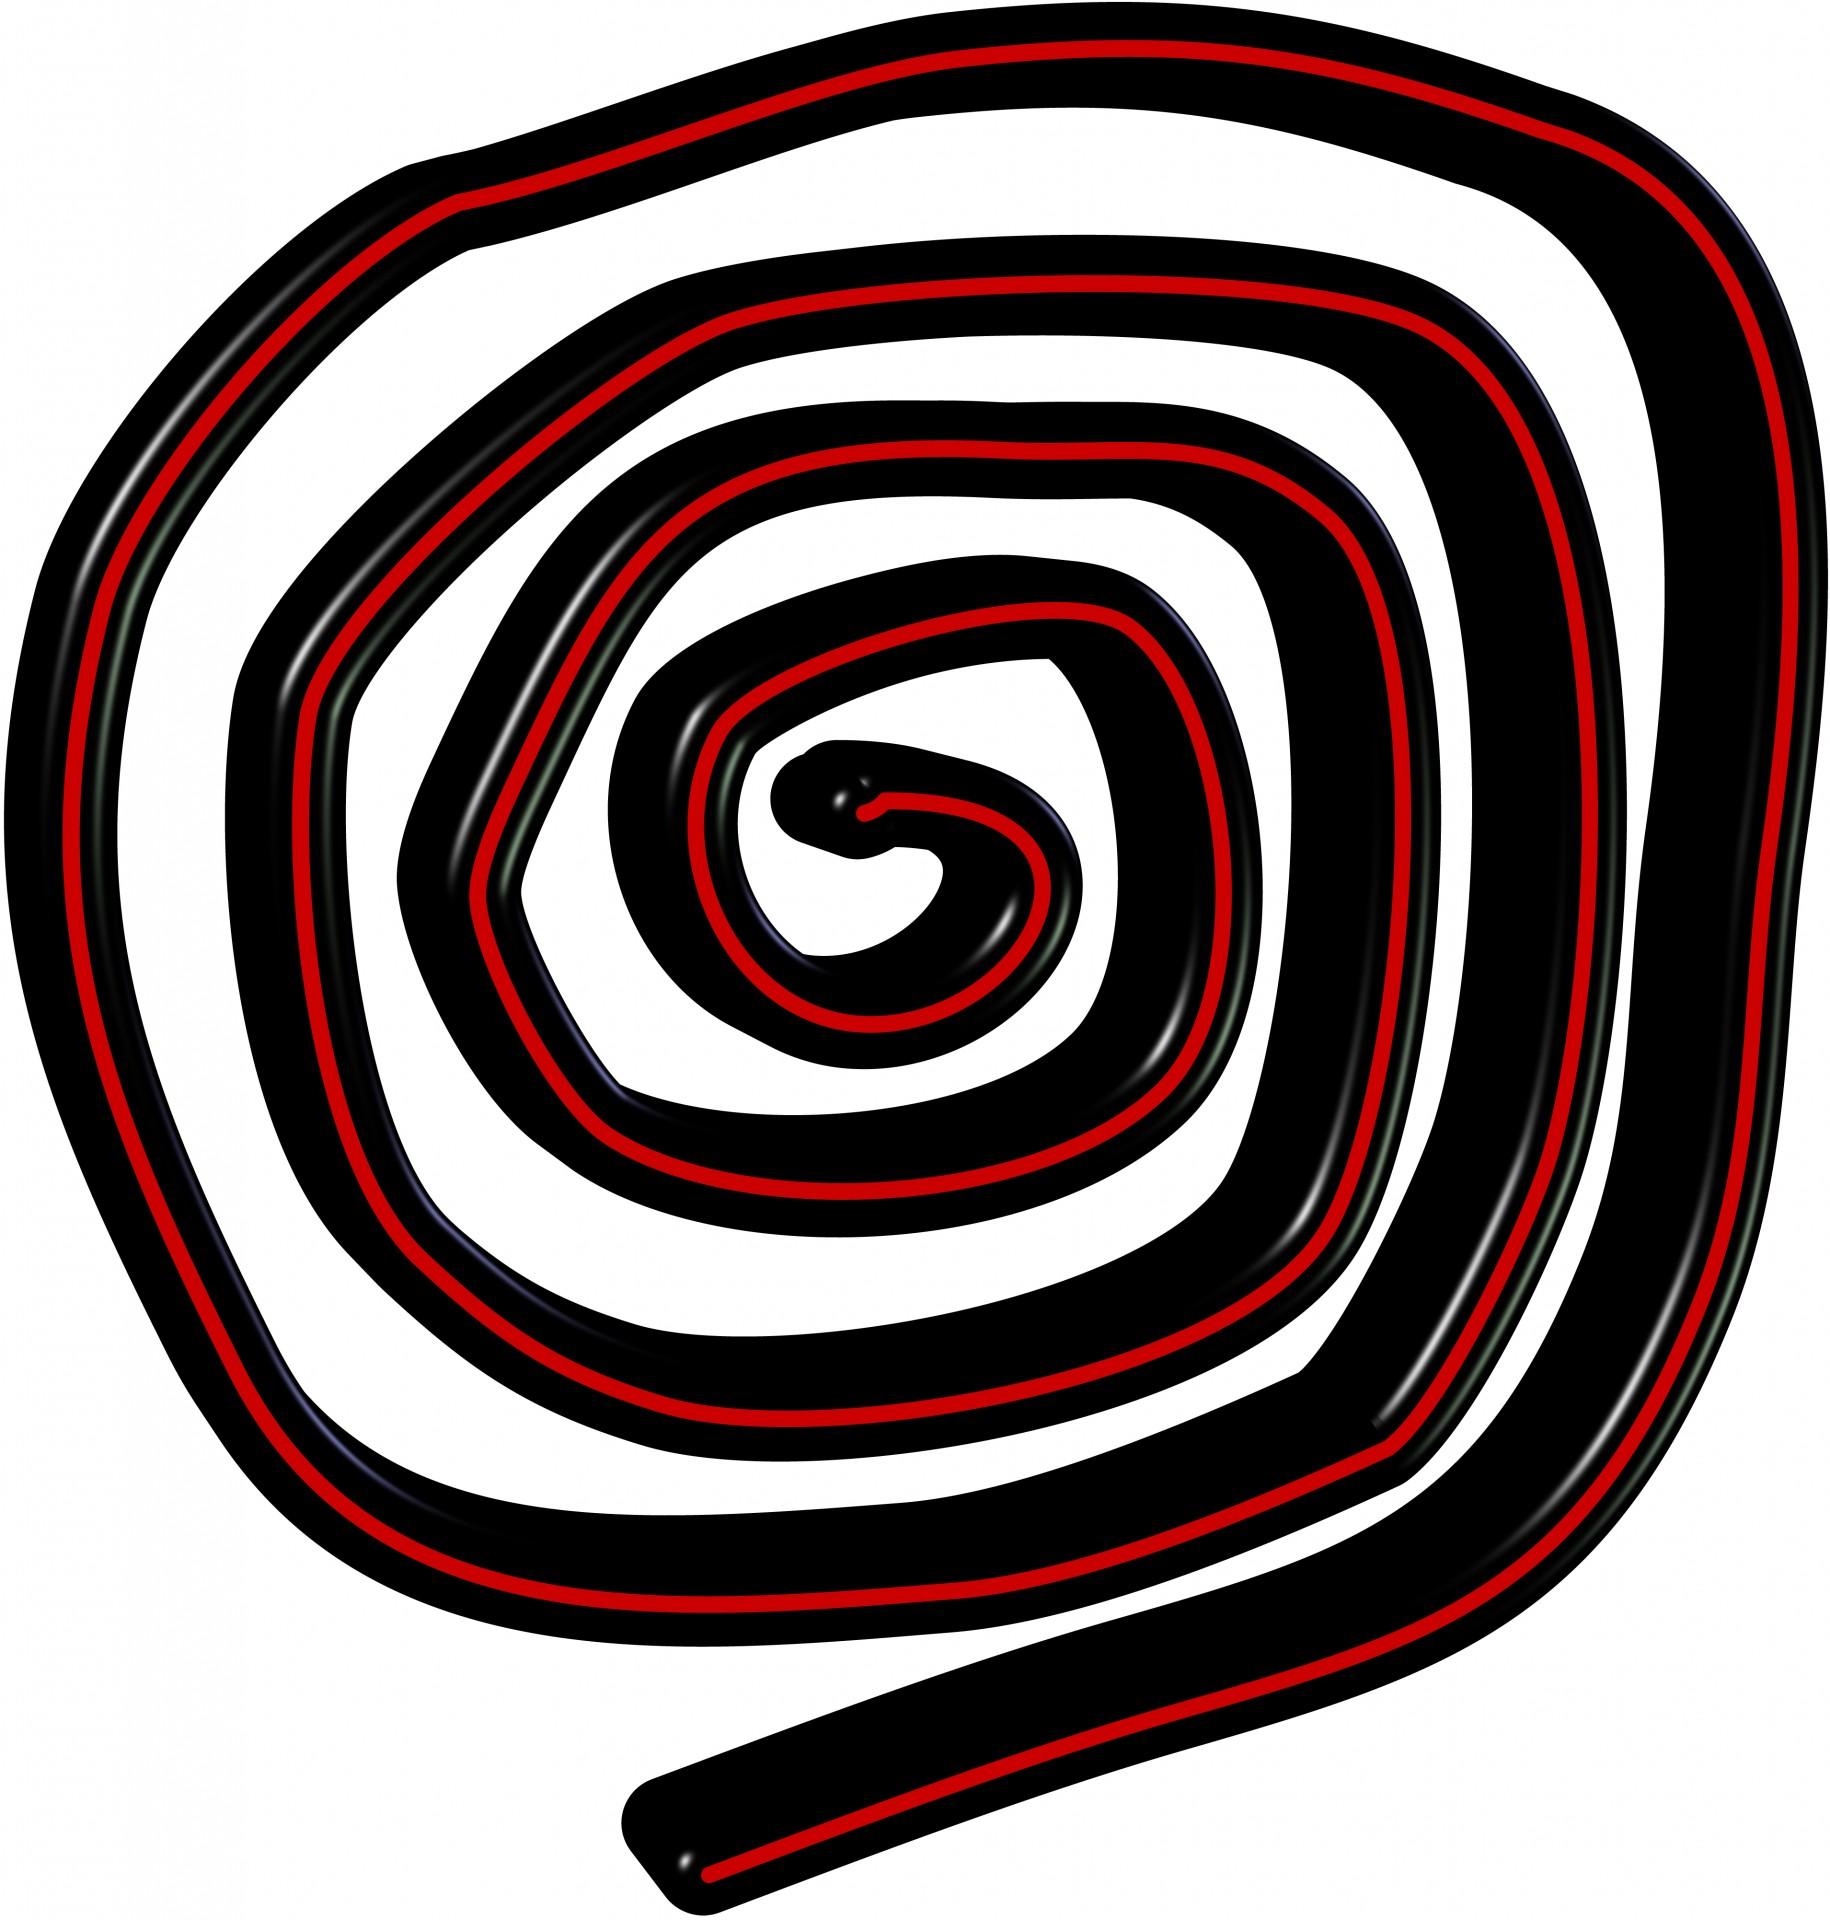 hand-draw-spiral.jpg